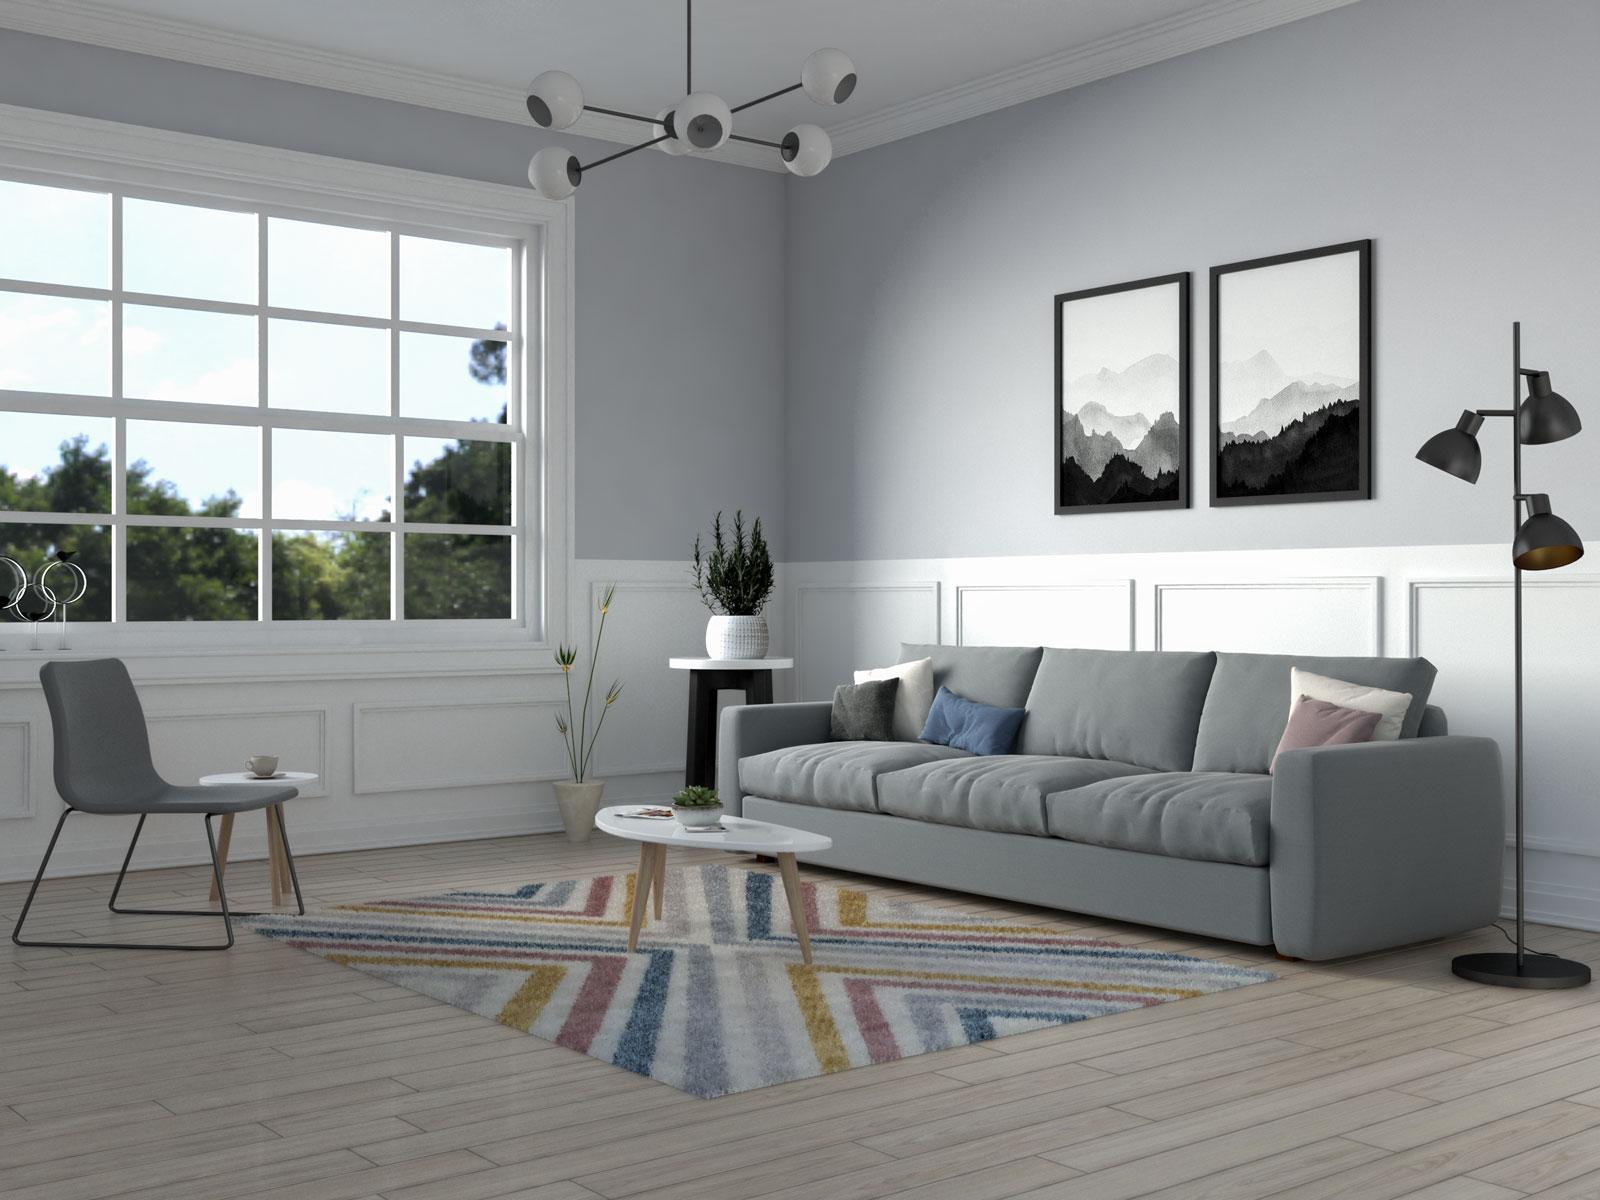 Contemporary chevron rug by nuLoom